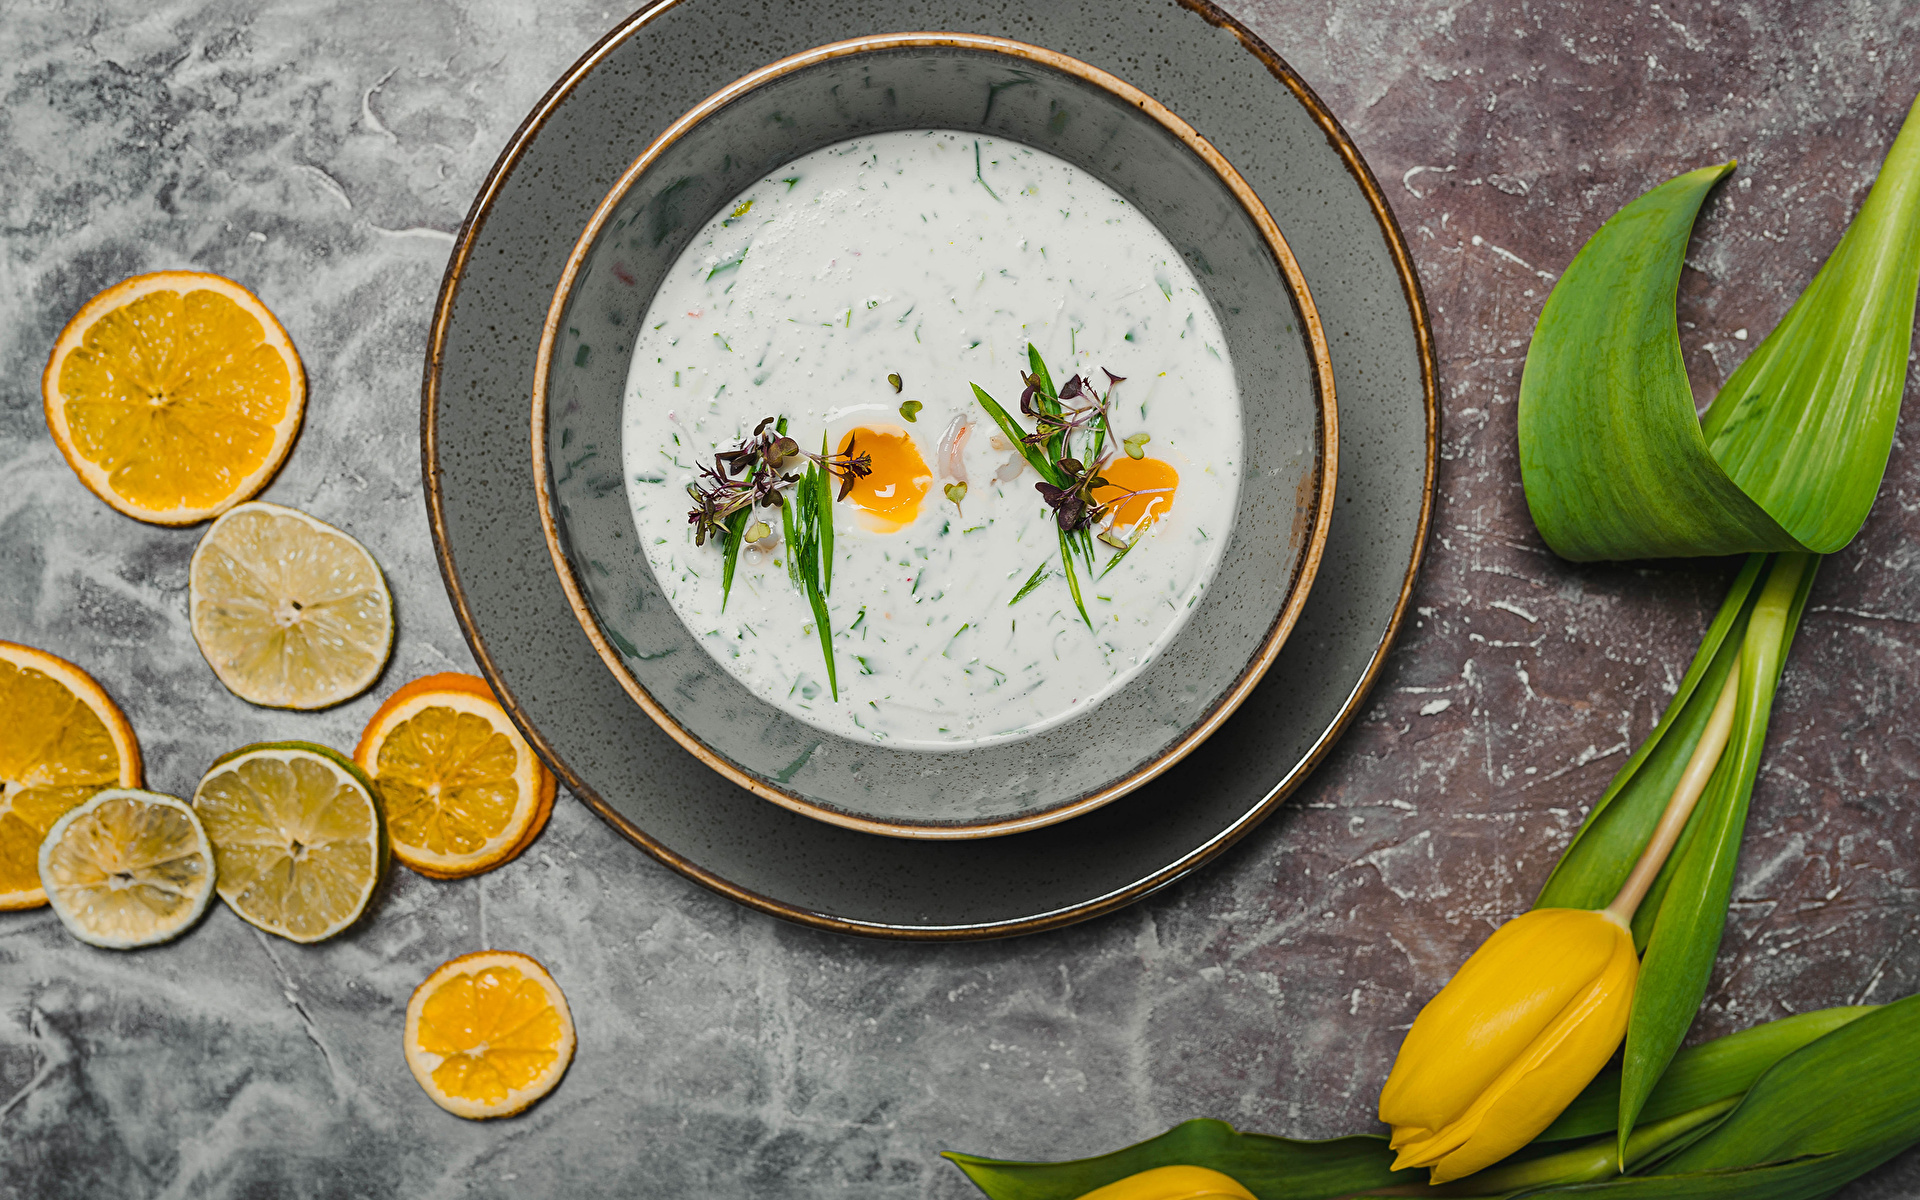 Фото тюльпан Цветы Лимоны Еда Супы Тарелка 1920x1200 Тюльпаны цветок Пища тарелке Продукты питания